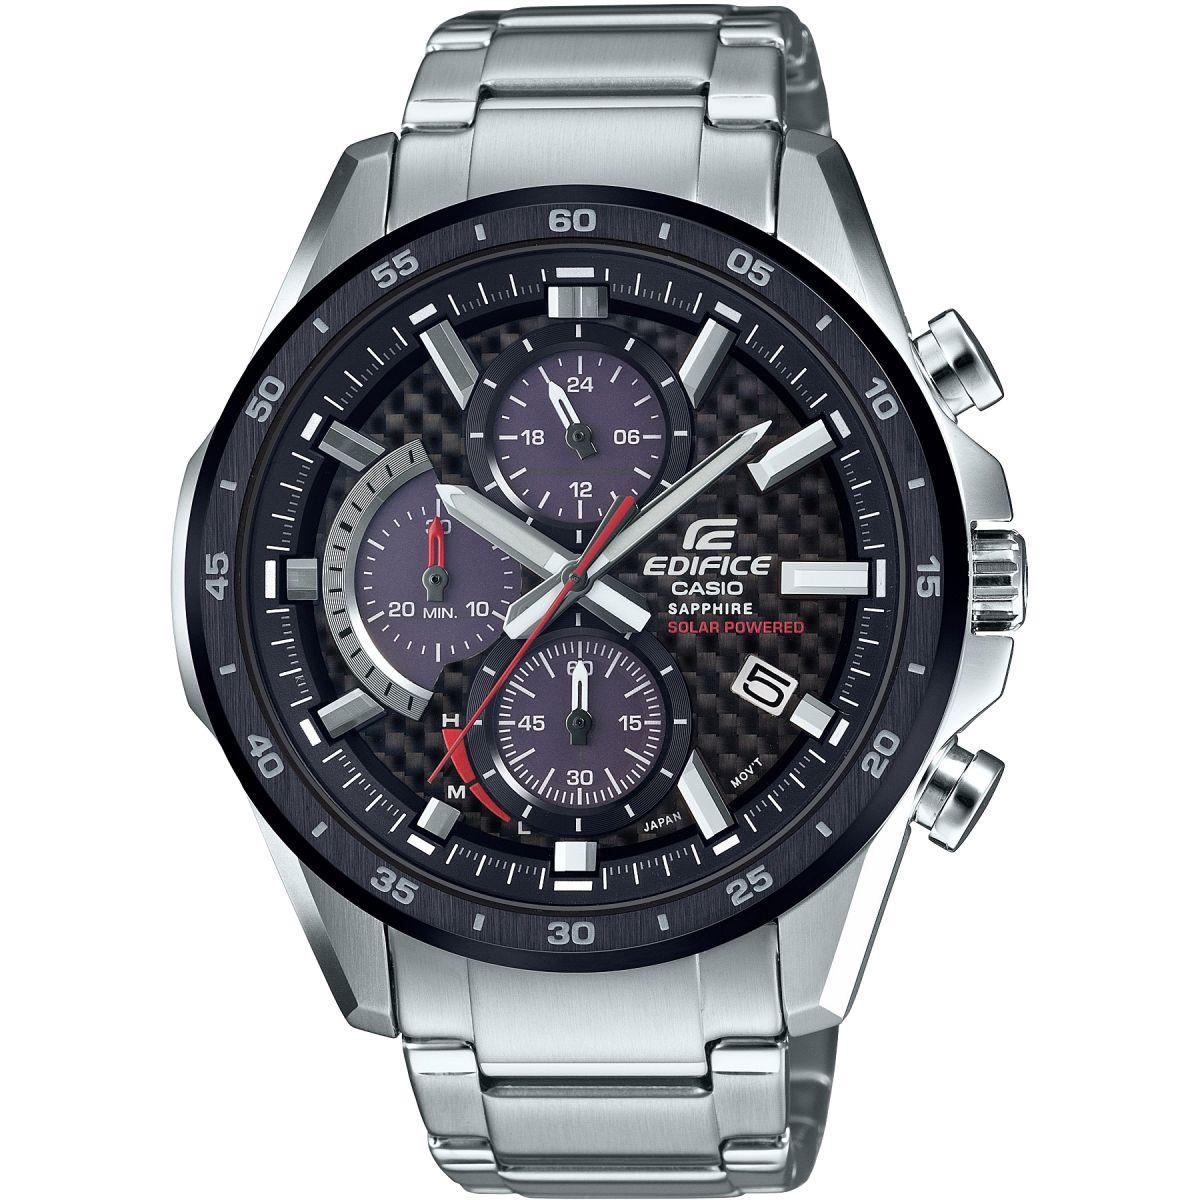 Casio Edifice Sapphire Solar Retrograde Watch - £89  at Watches2U